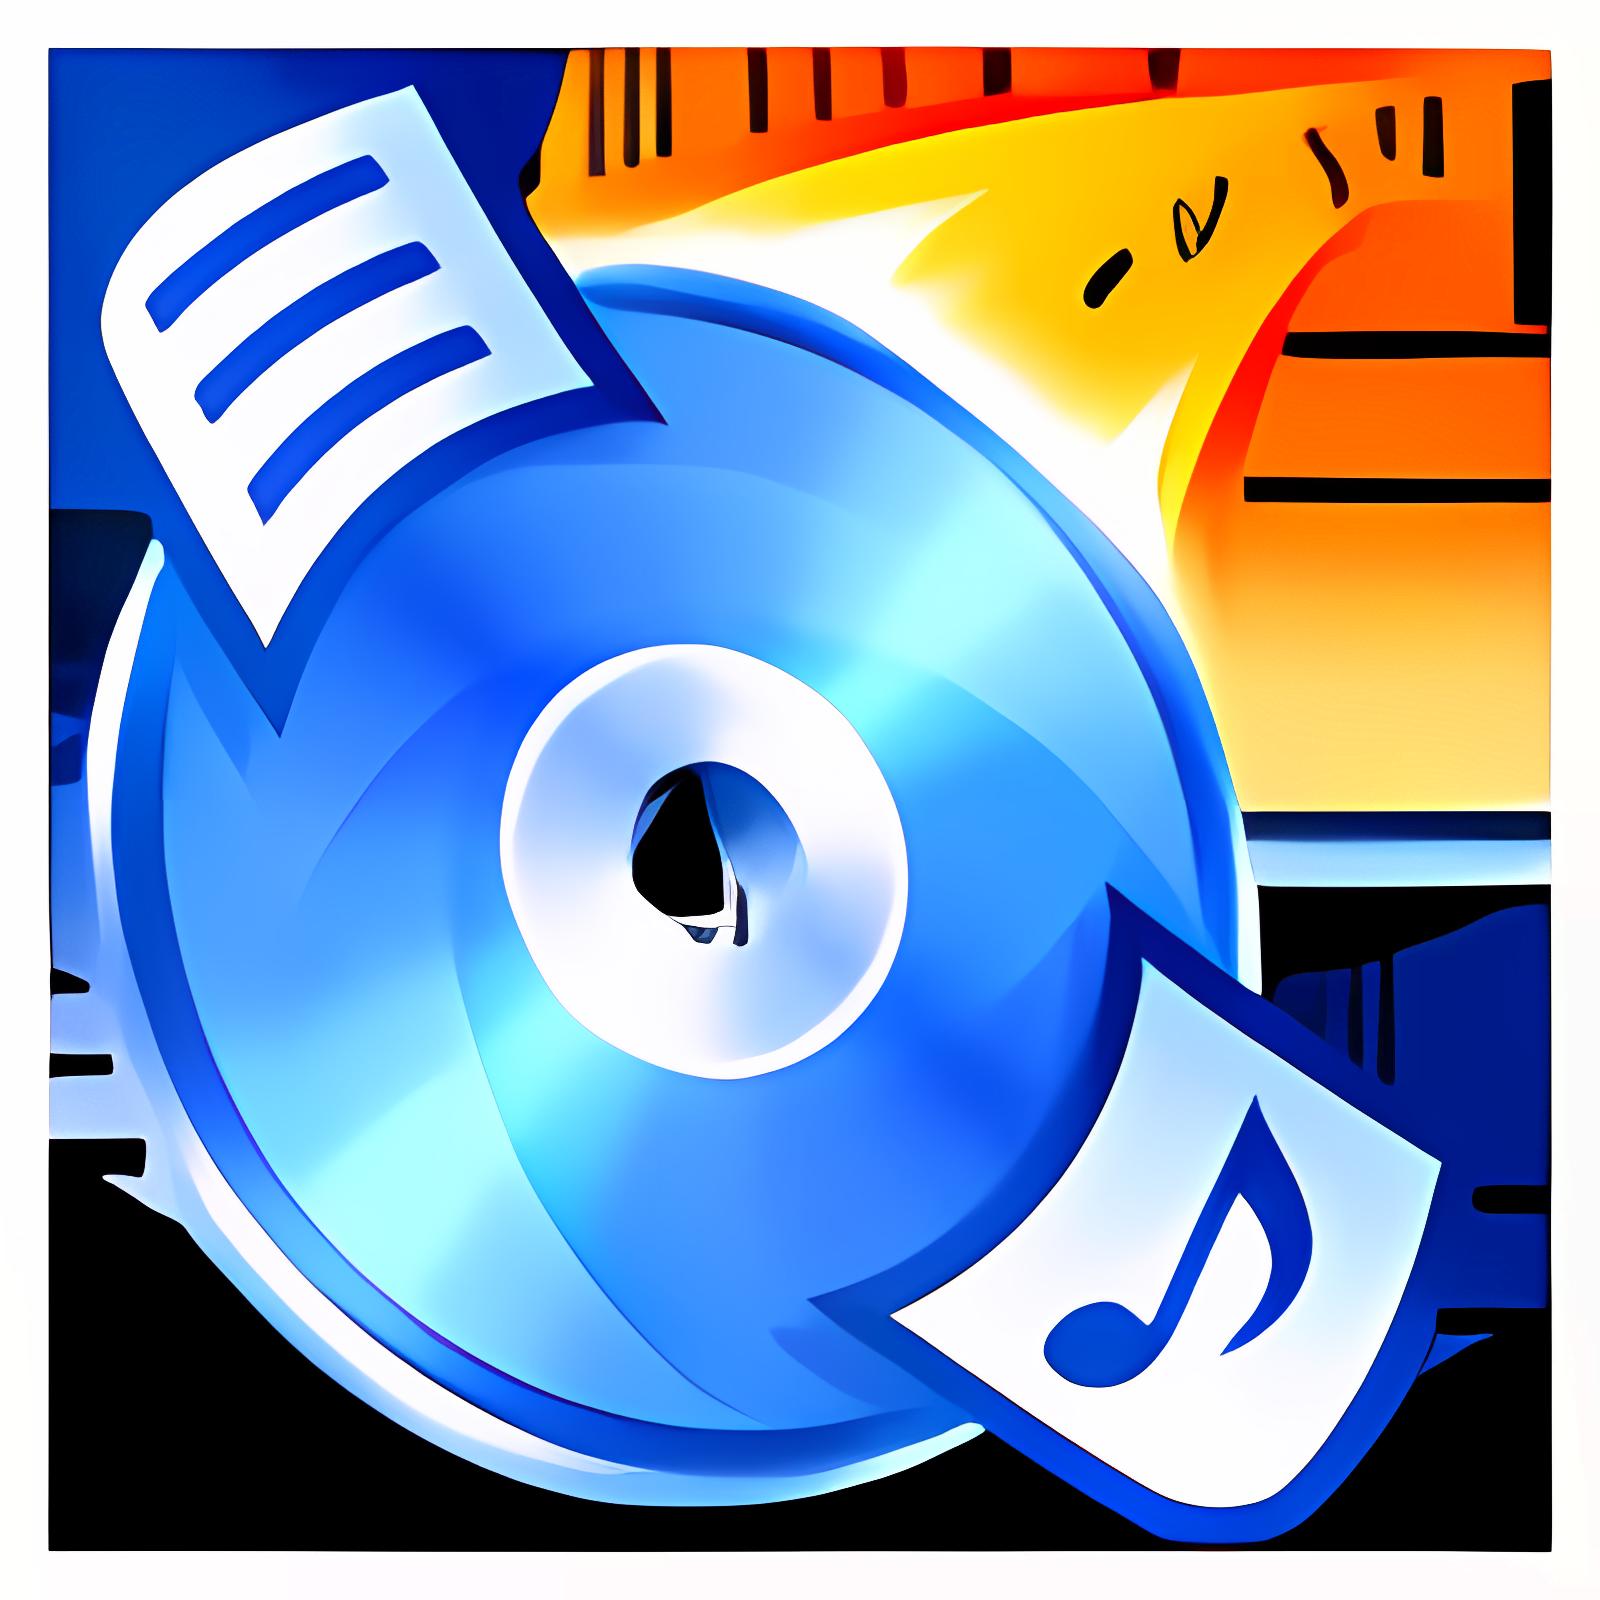 CDBurnerXP Portable 4.5.3.4746 (64 bit)